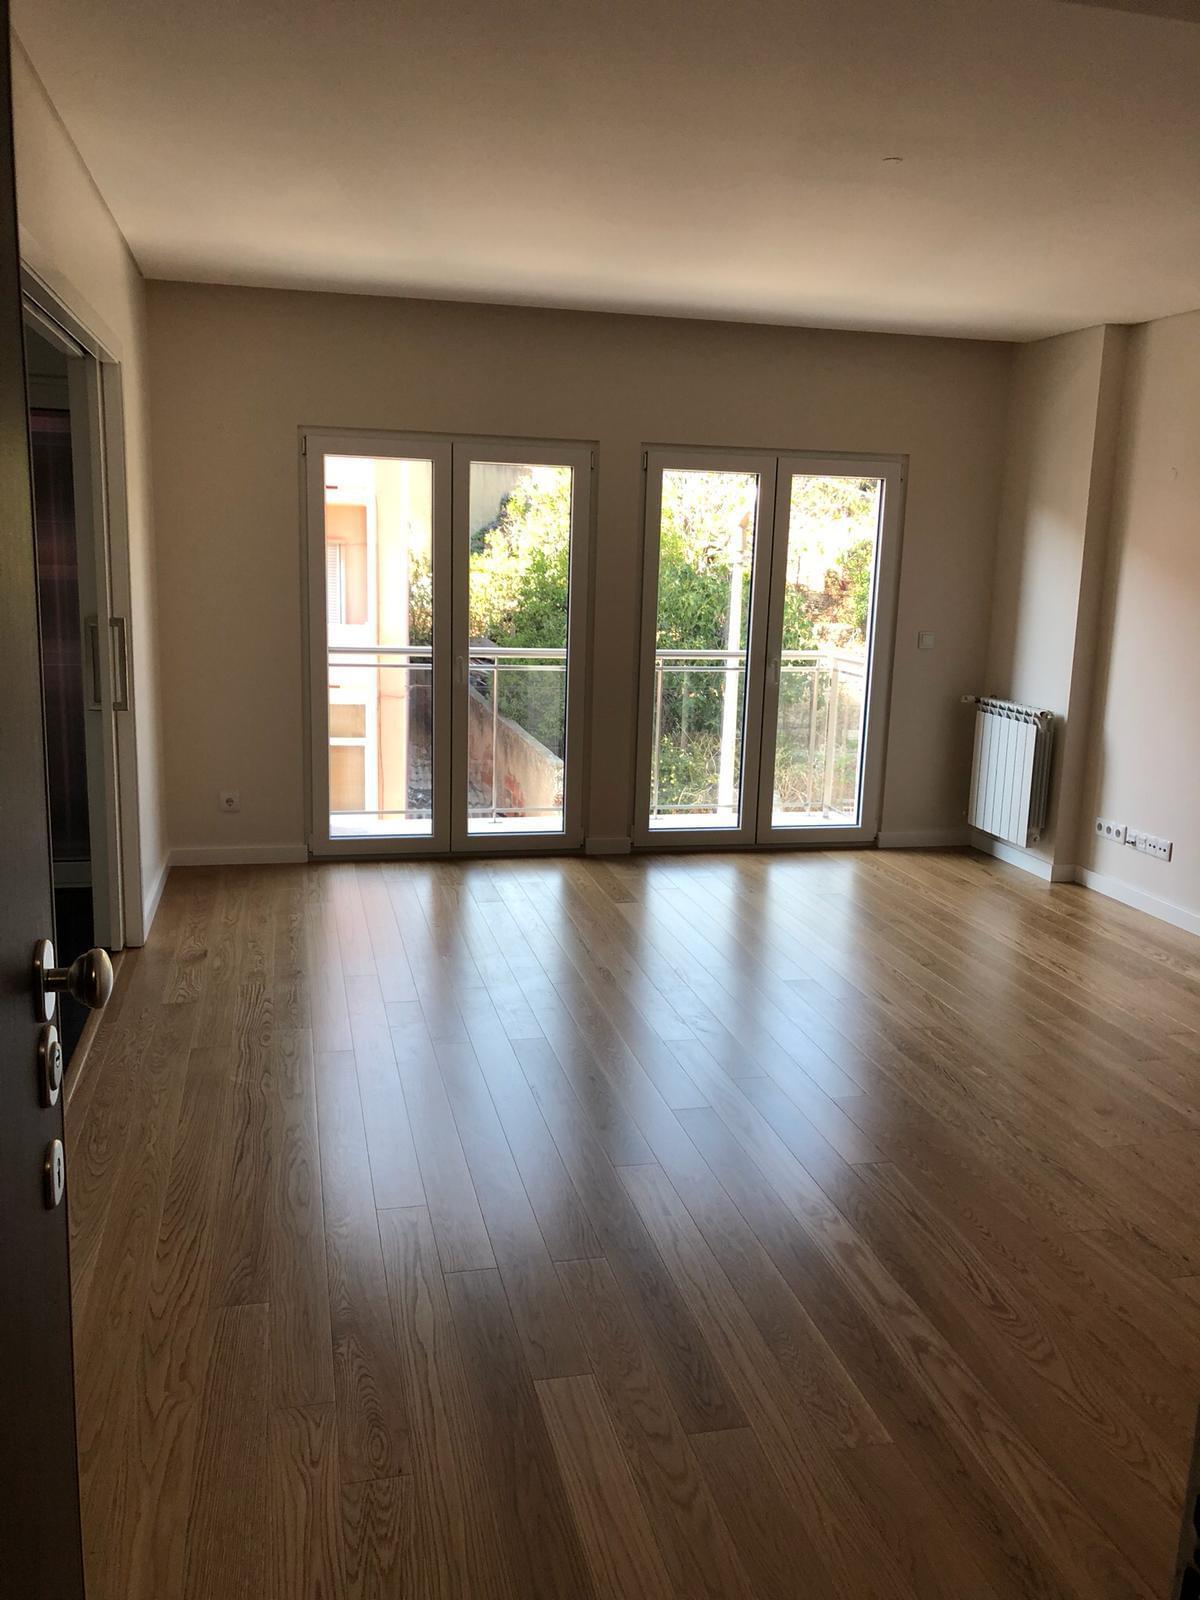 pf18232-apartamento-t2-lisboa-a098f044-5e1d-48e4-858c-84777d7d3e00